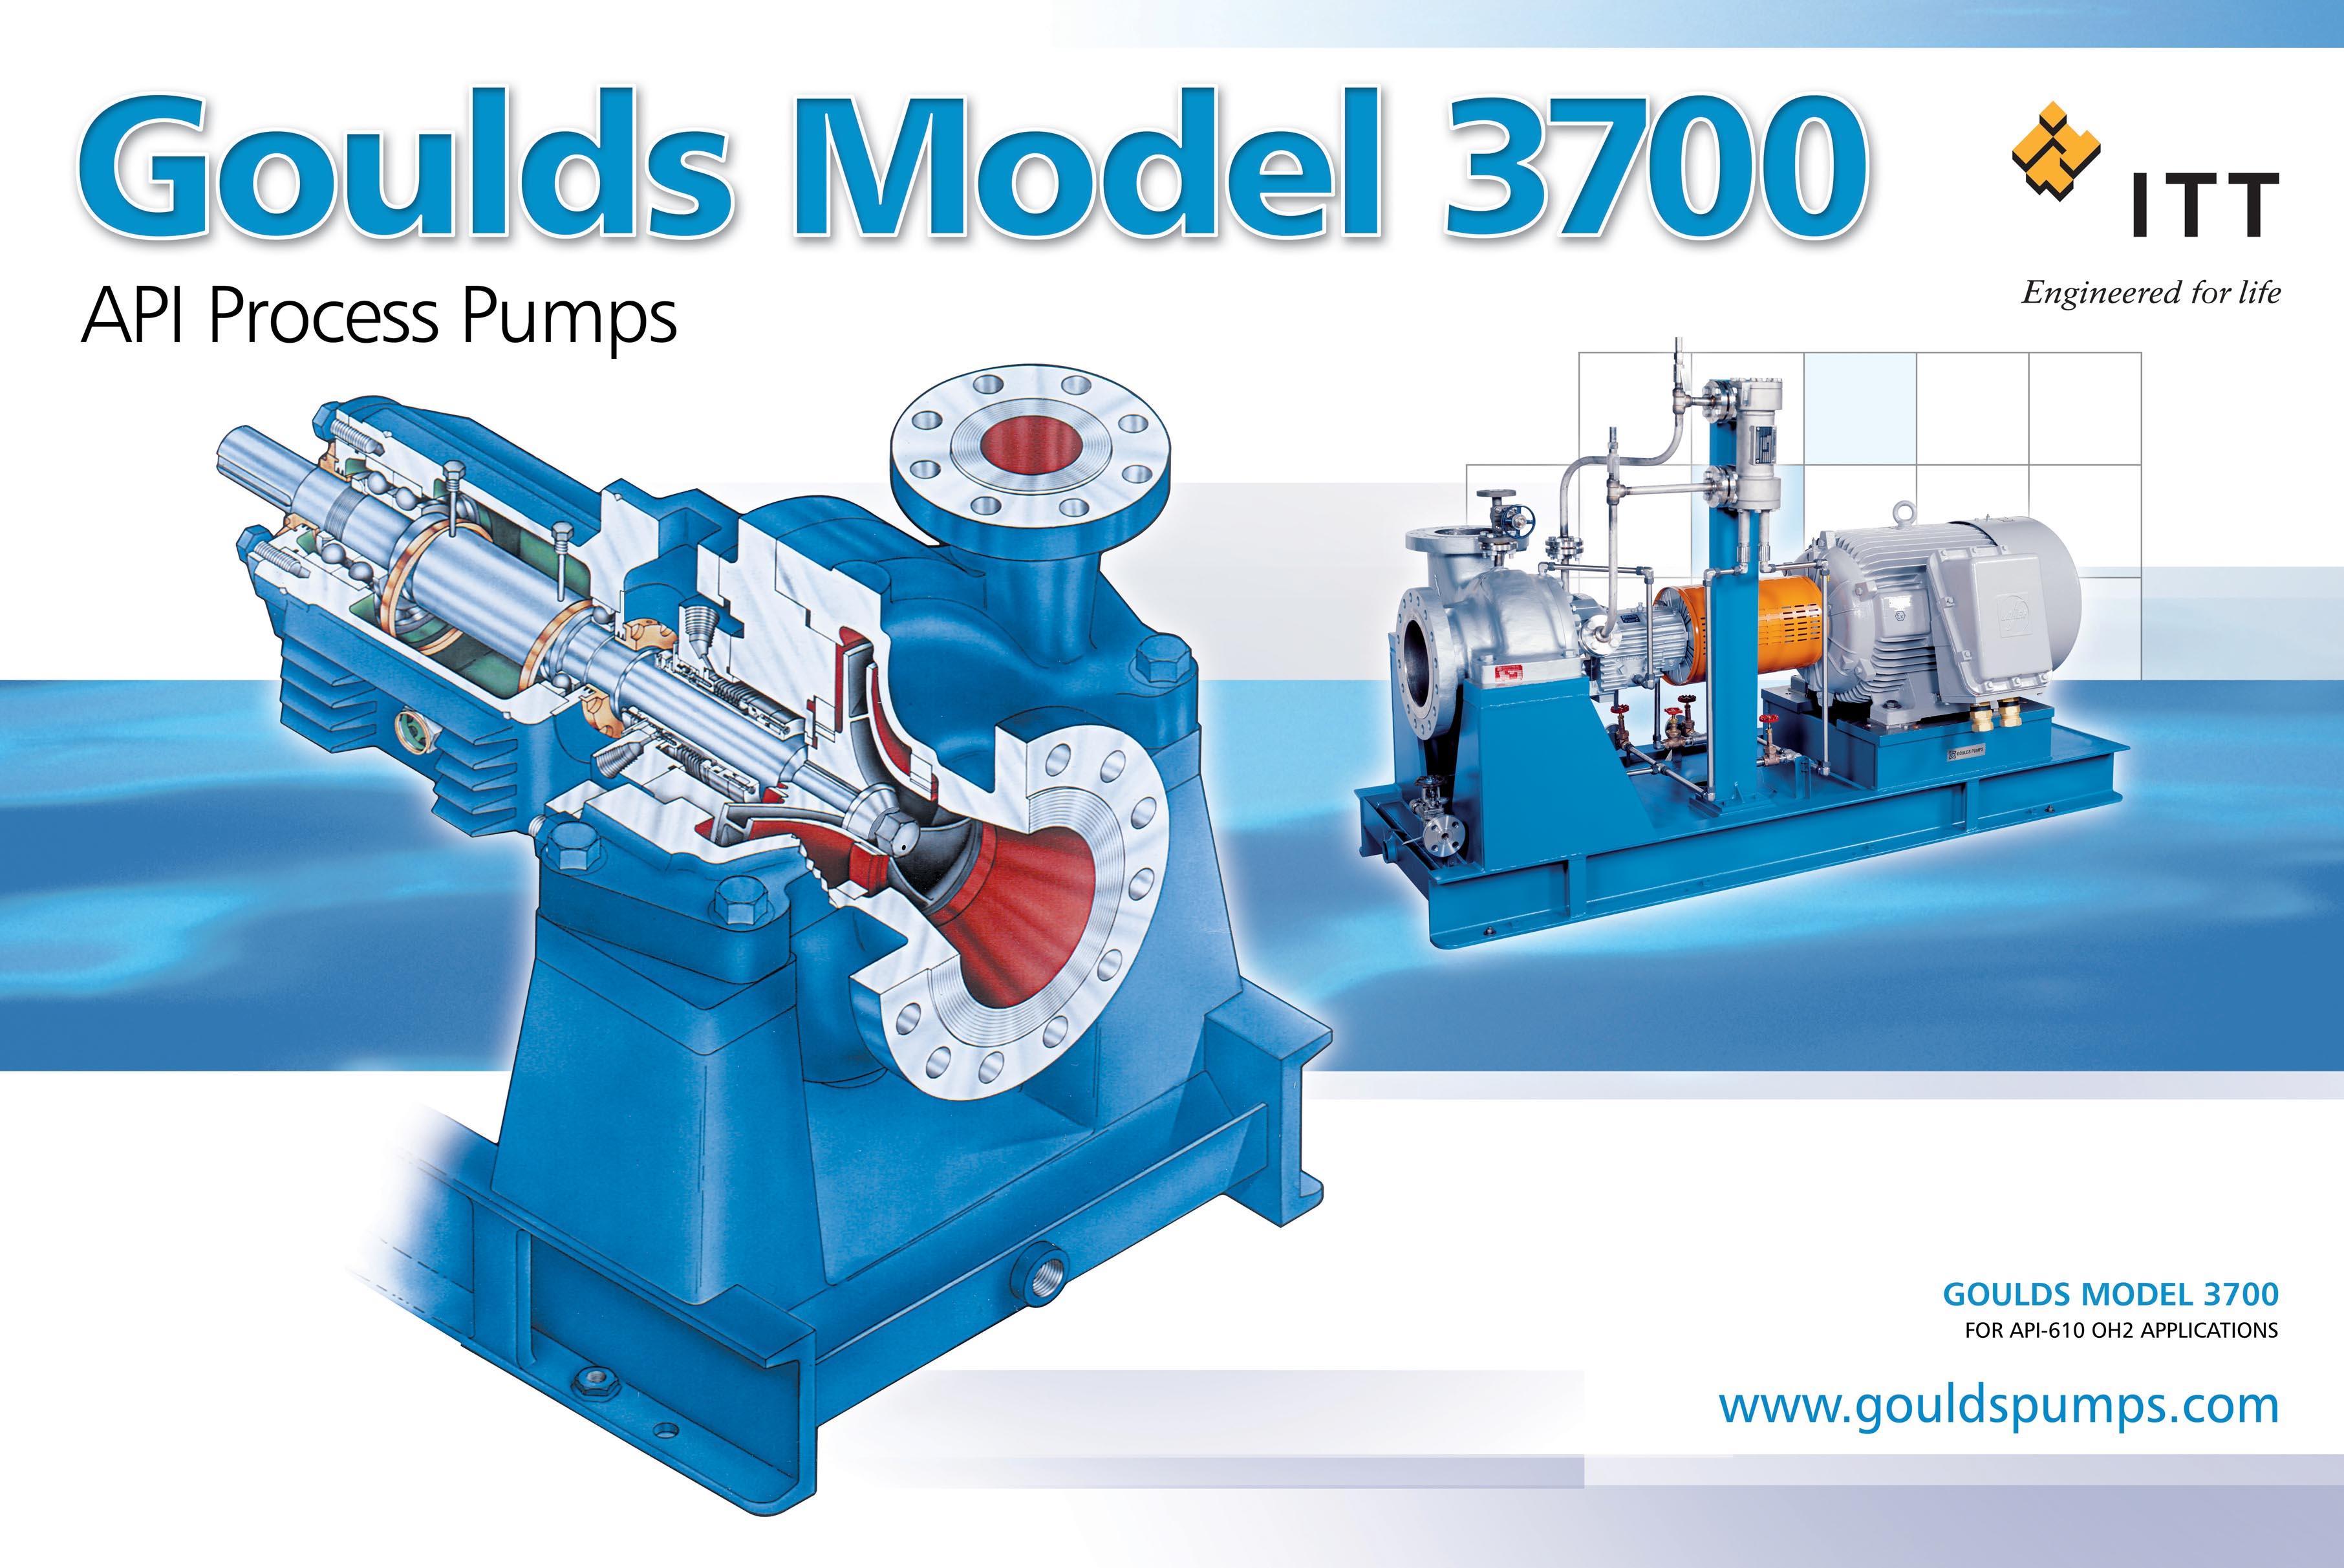 3700 single stage  overhung process pump goulds pumps daikin heat pump installation manual goodman heat pump installation manual